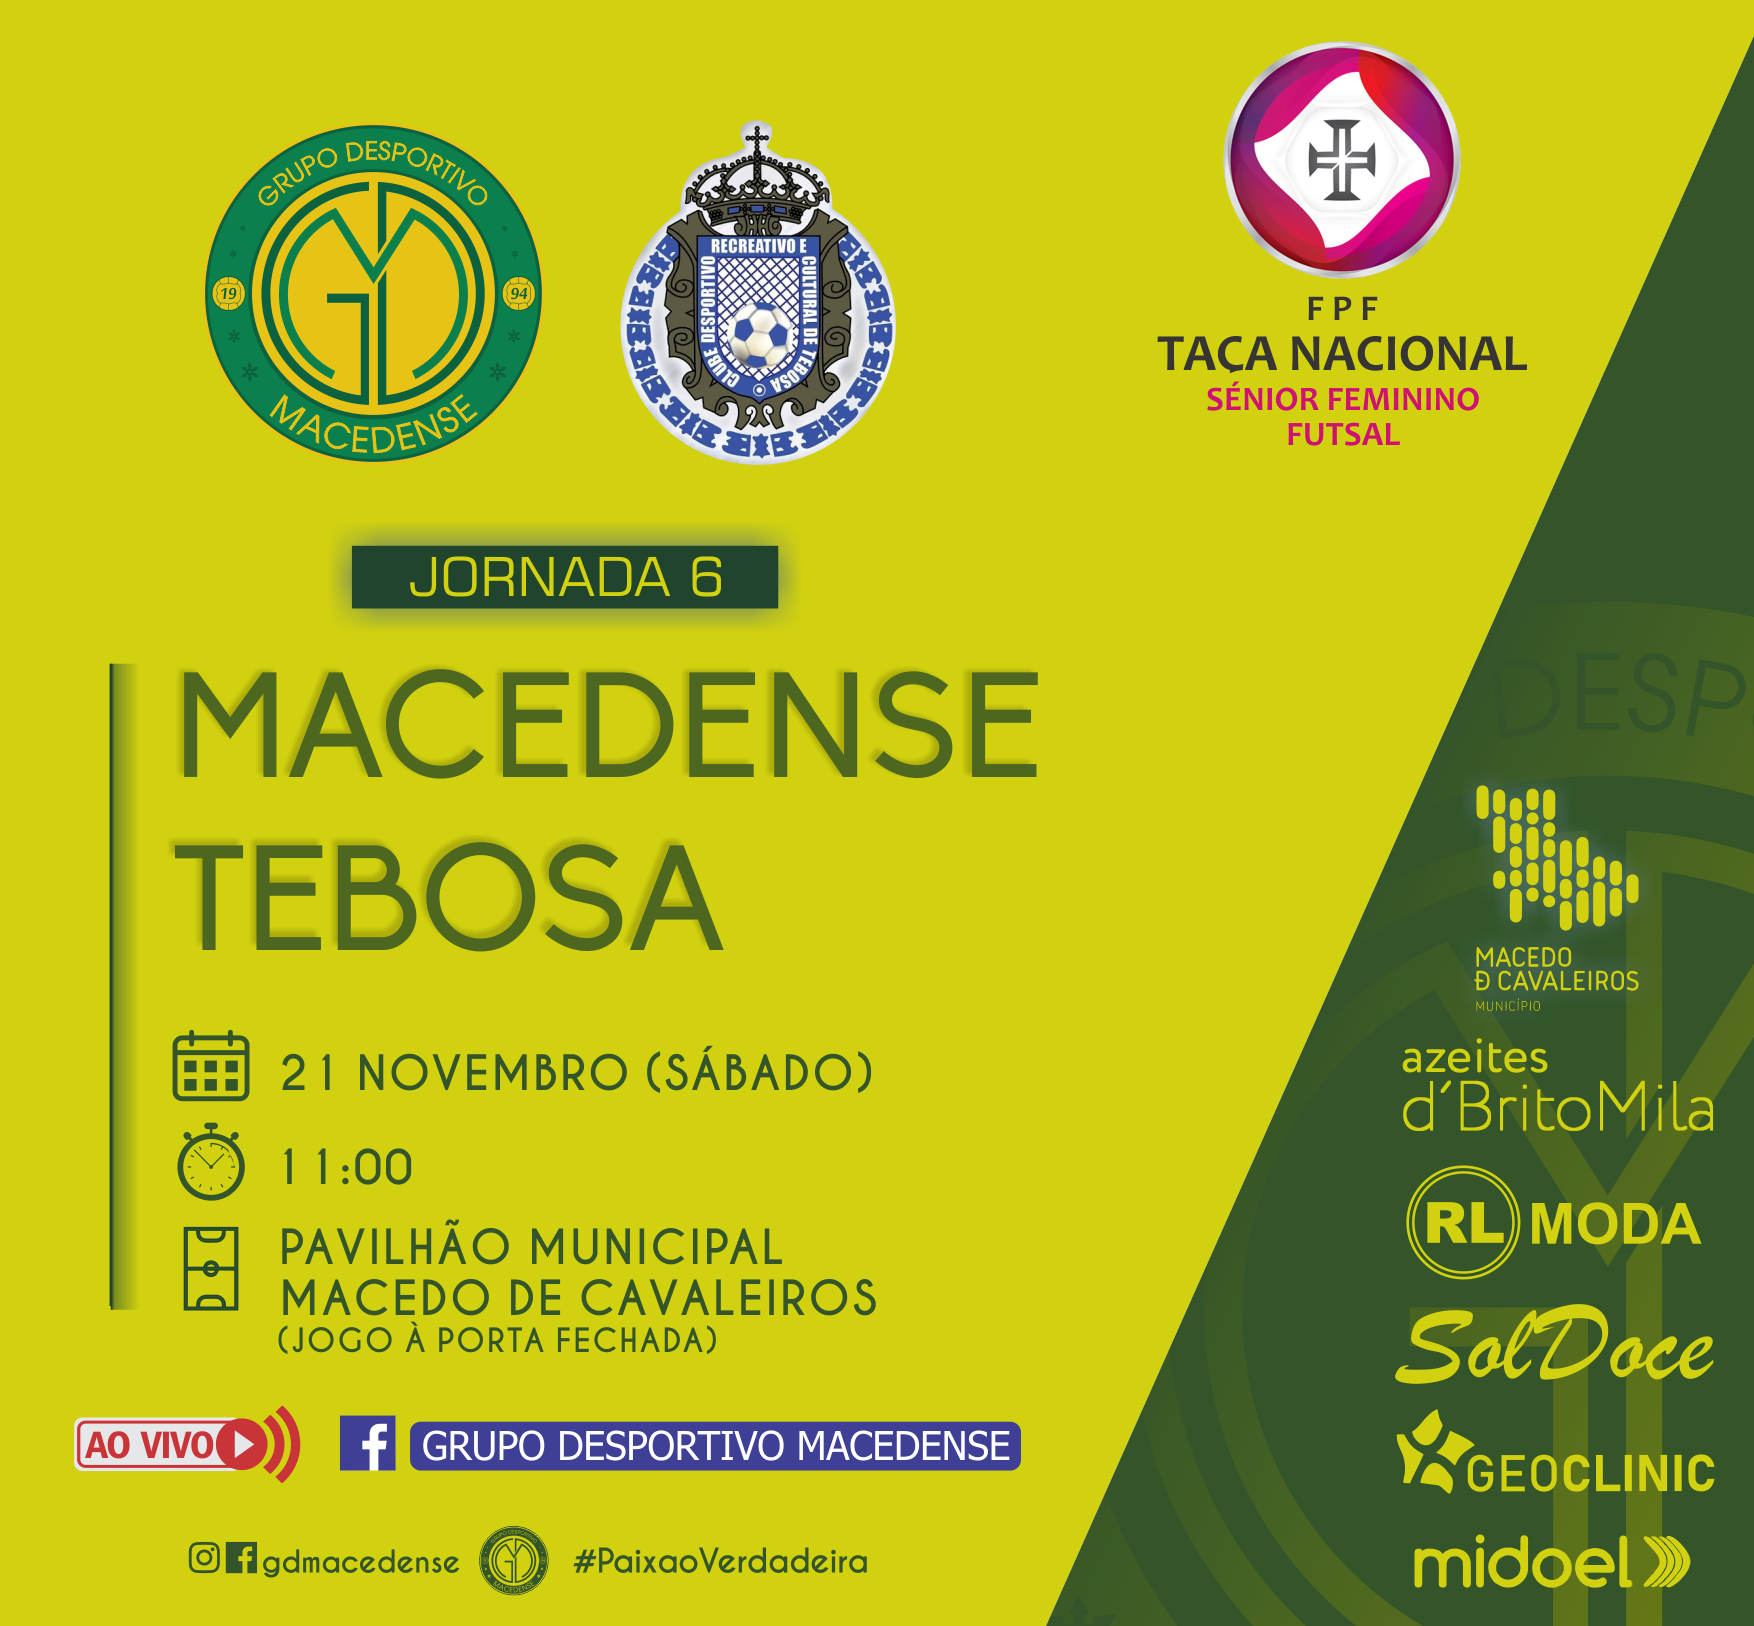 Macedense recebe Tebosa na última jornada da Taça Nacional